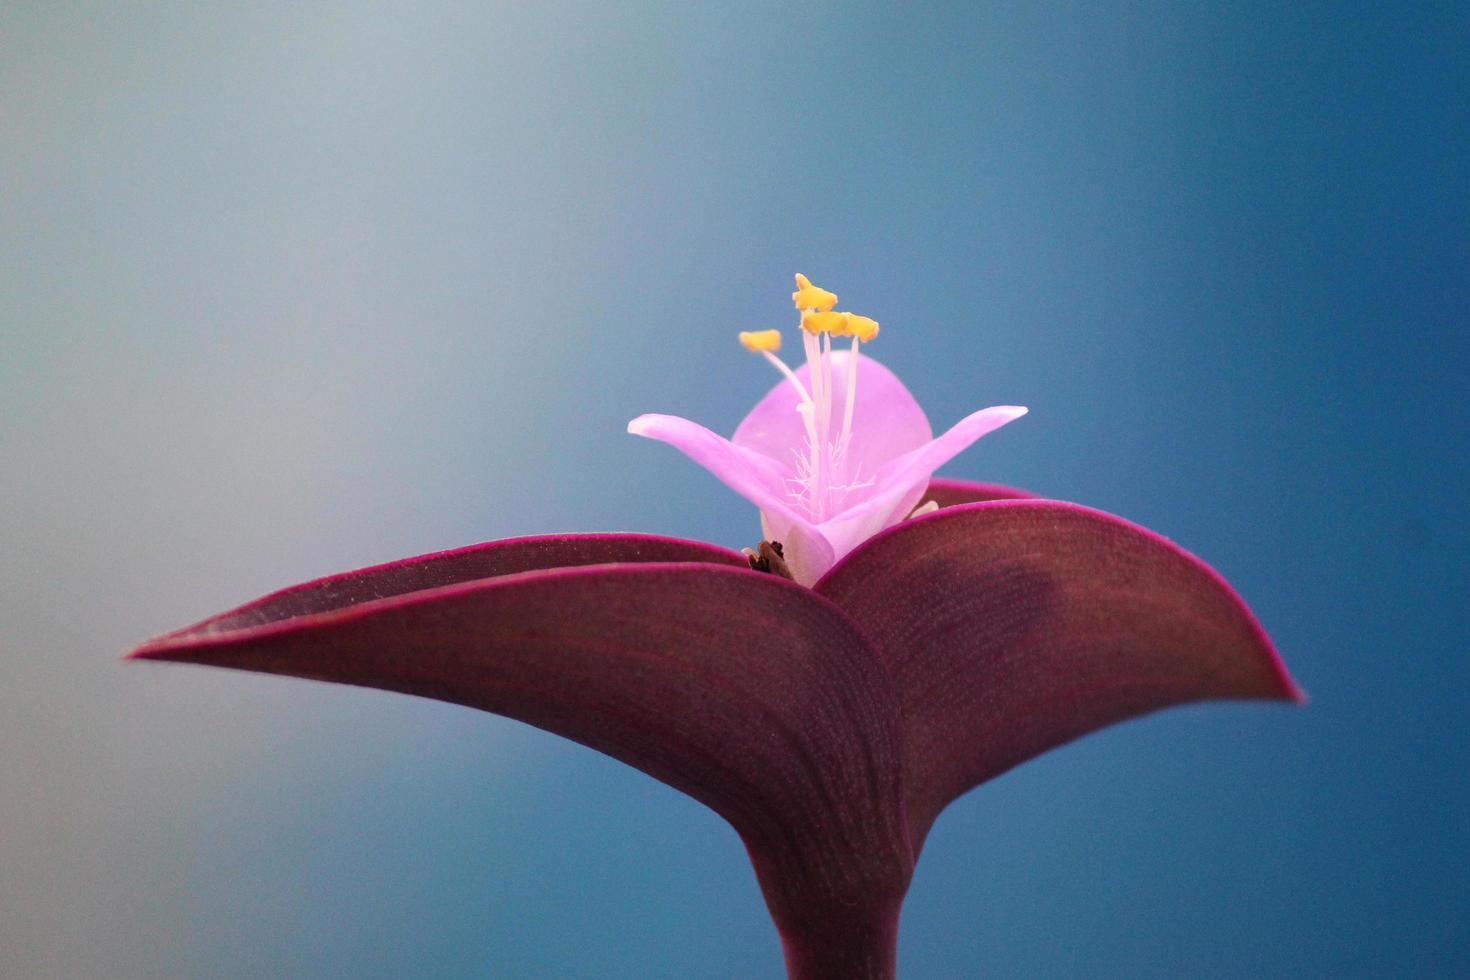 schöne Orchidee in voller Blüte foto